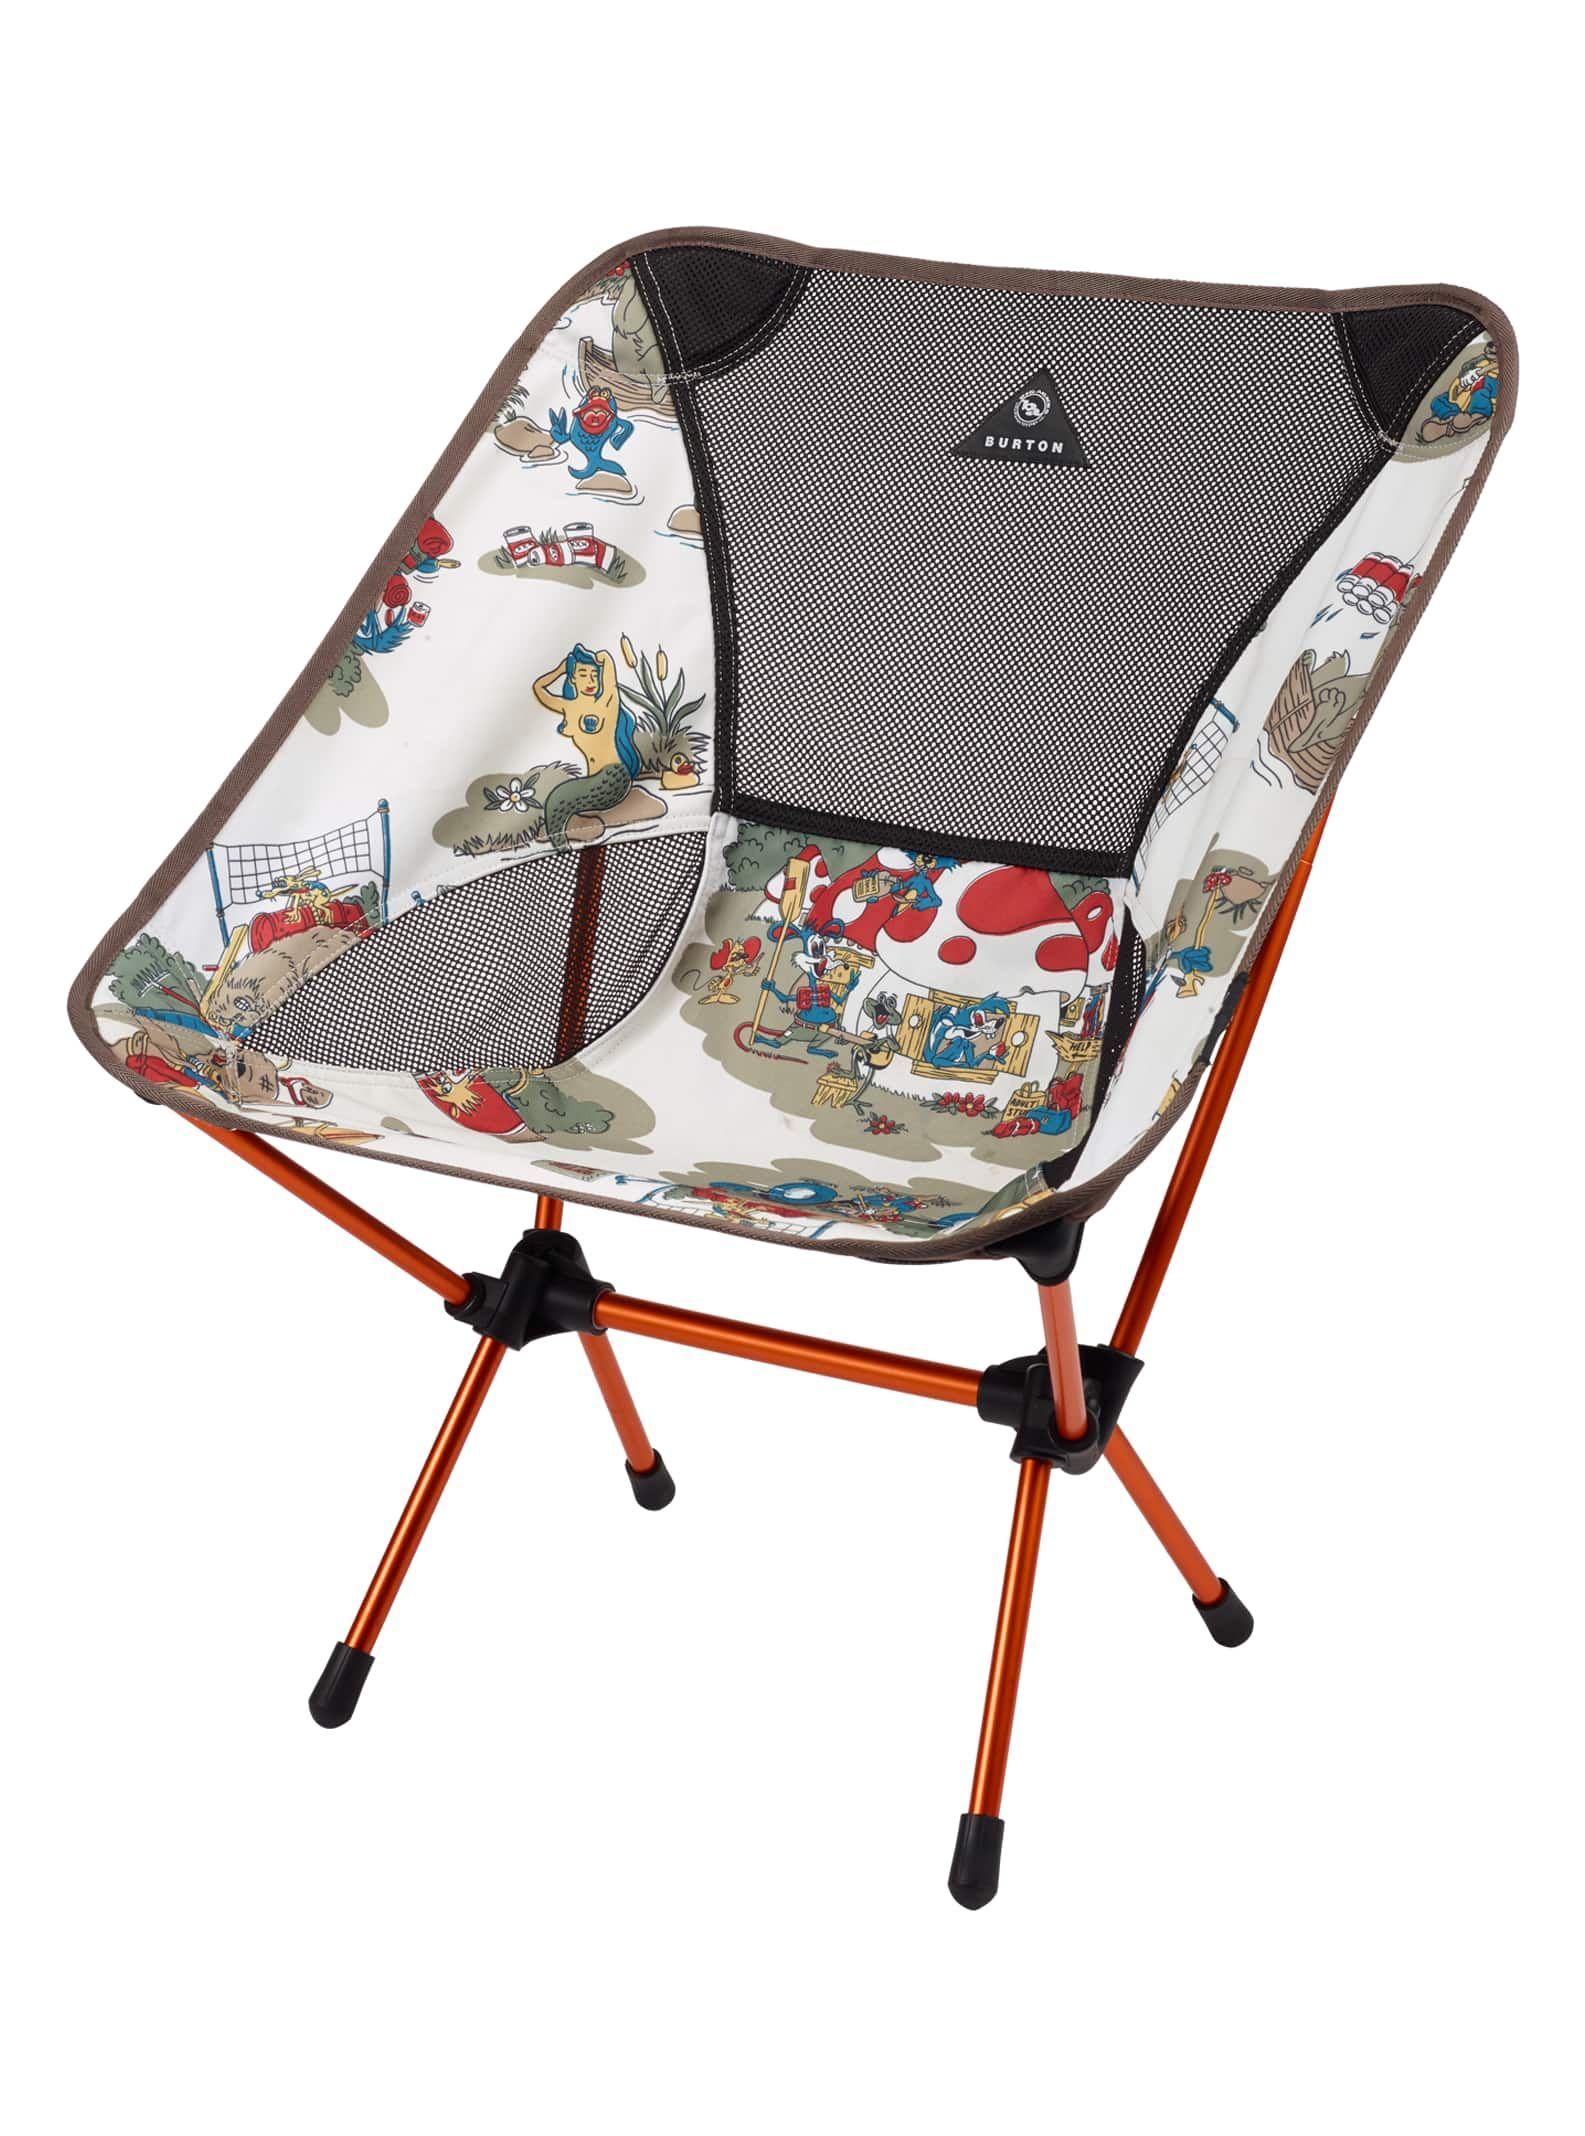 Tremendous Big Agnes X Helinox X Burton Camping Chair One In 2019 Ibusinesslaw Wood Chair Design Ideas Ibusinesslaworg